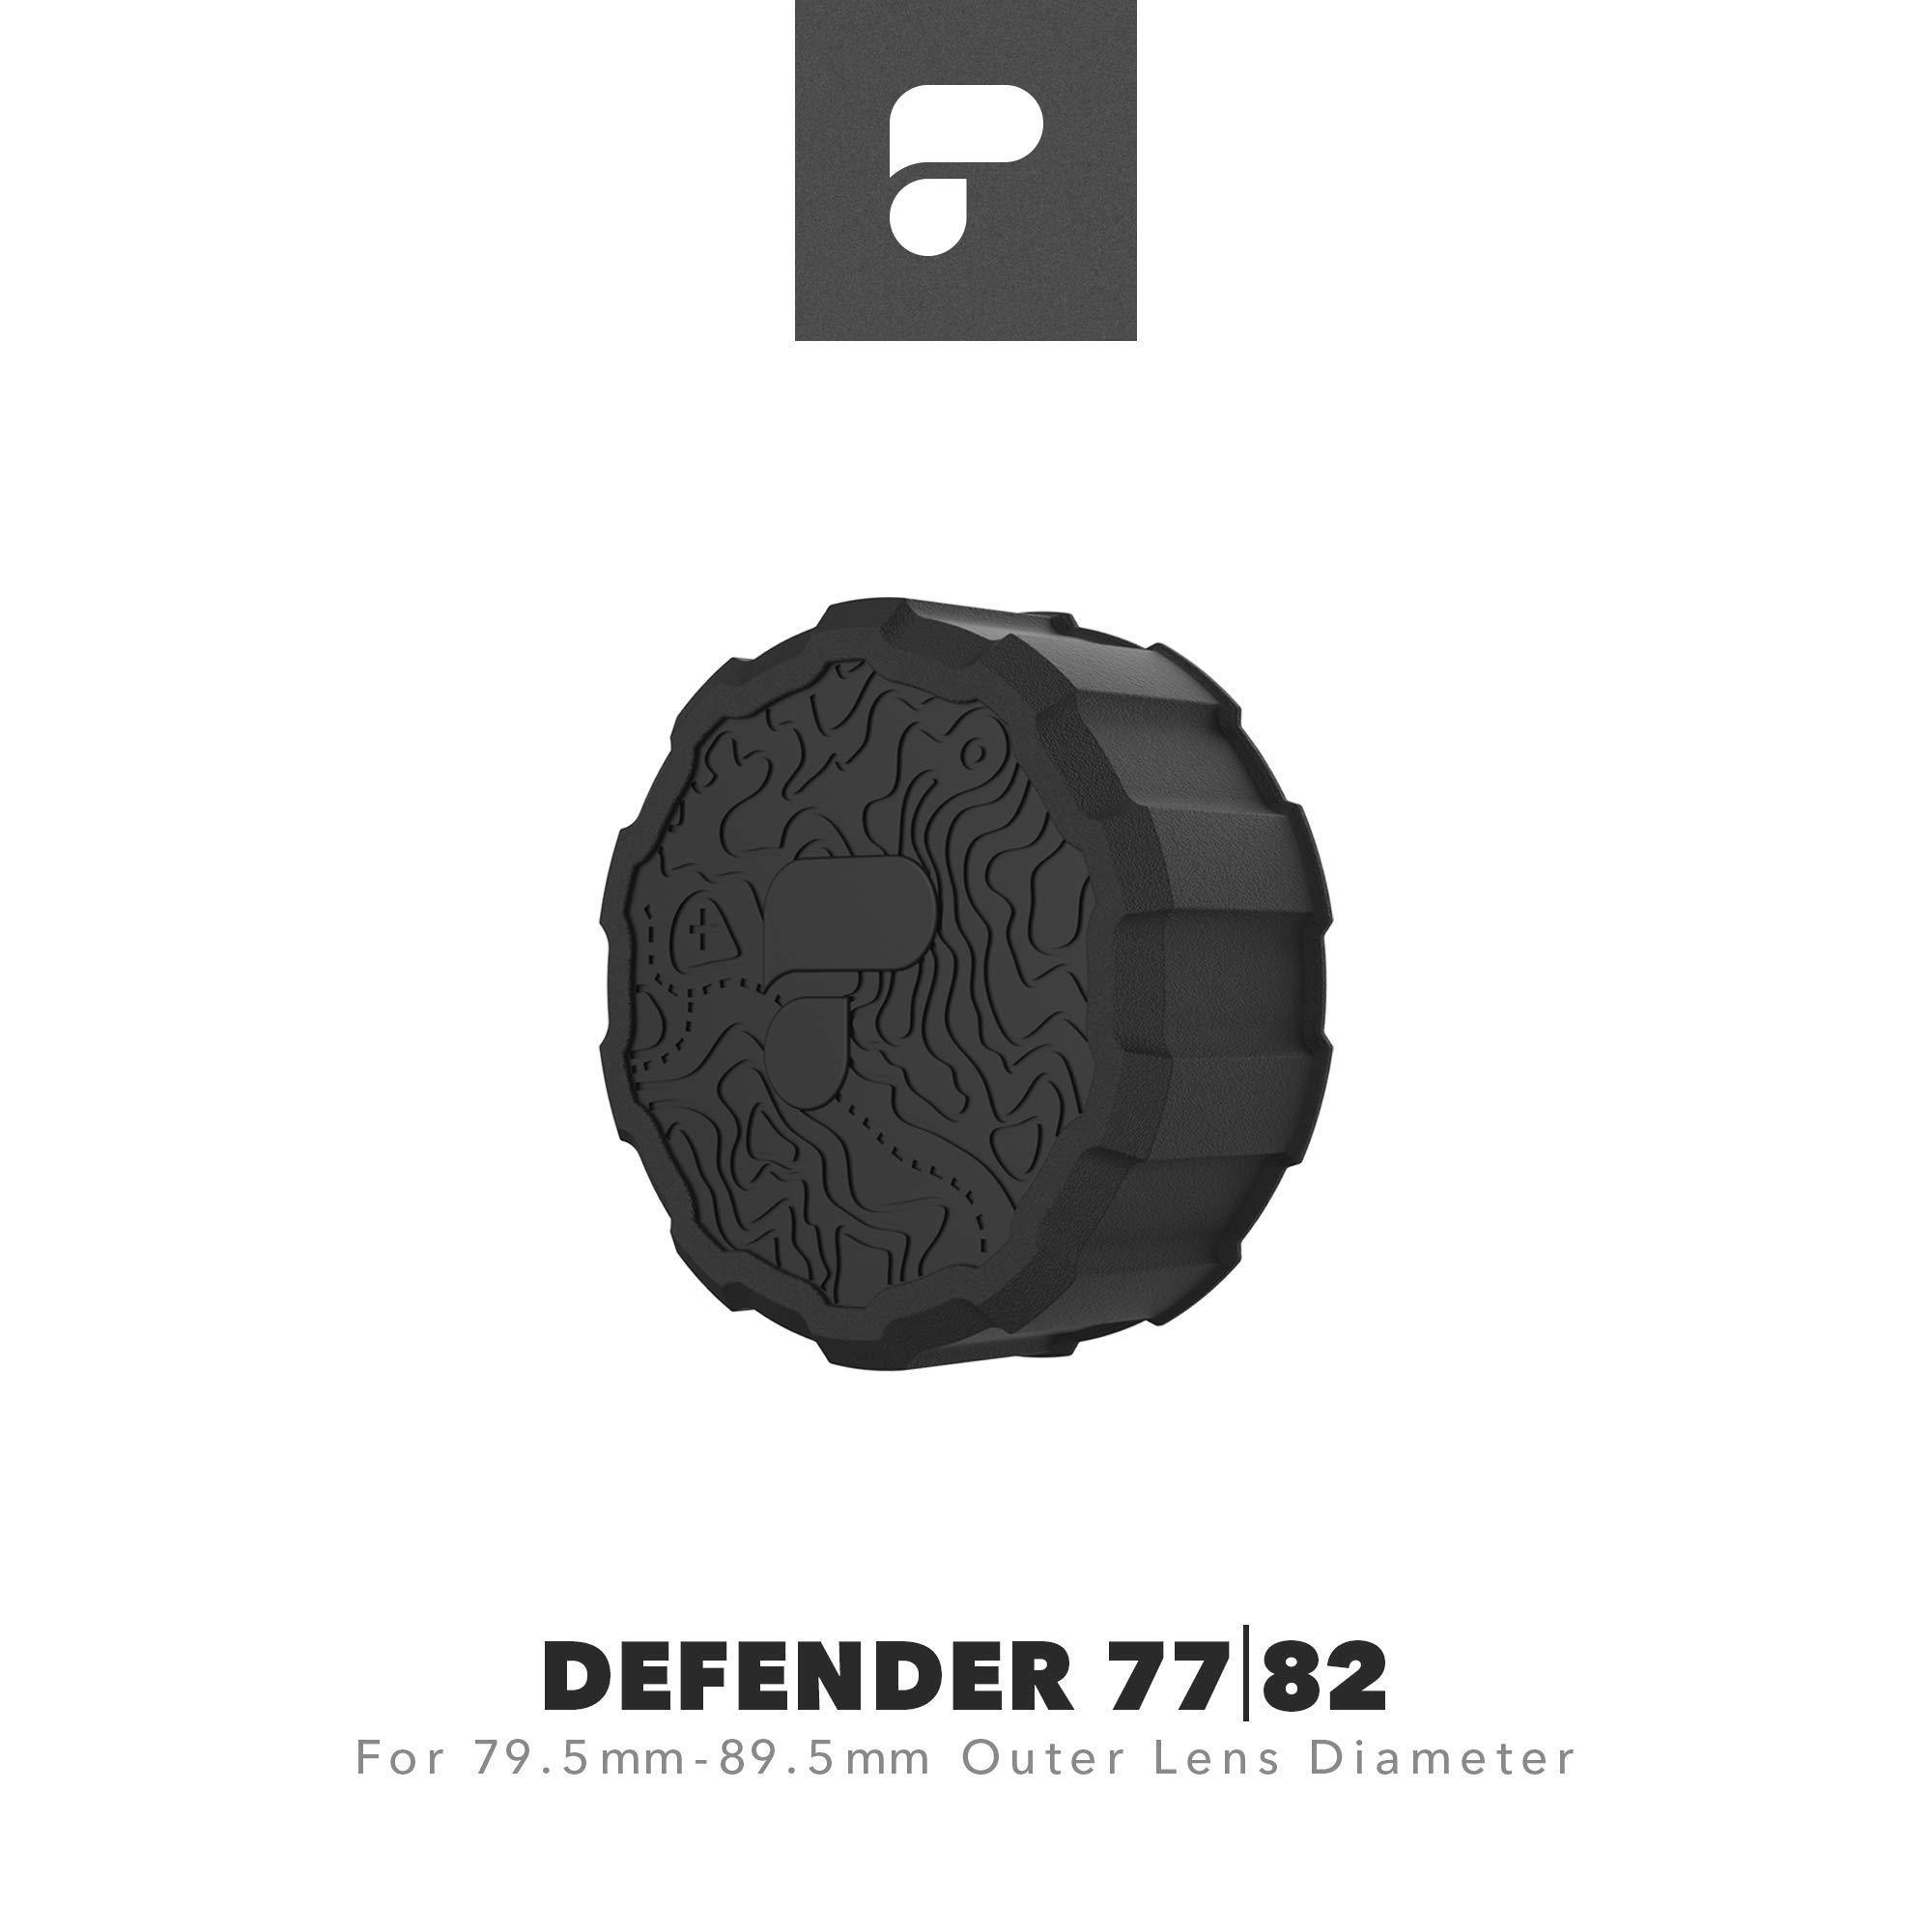 PolarPro Defender 77   82 Lens Cover (Fits Lenses with 79.5mm-89.5mm Outer Lens Diameter)